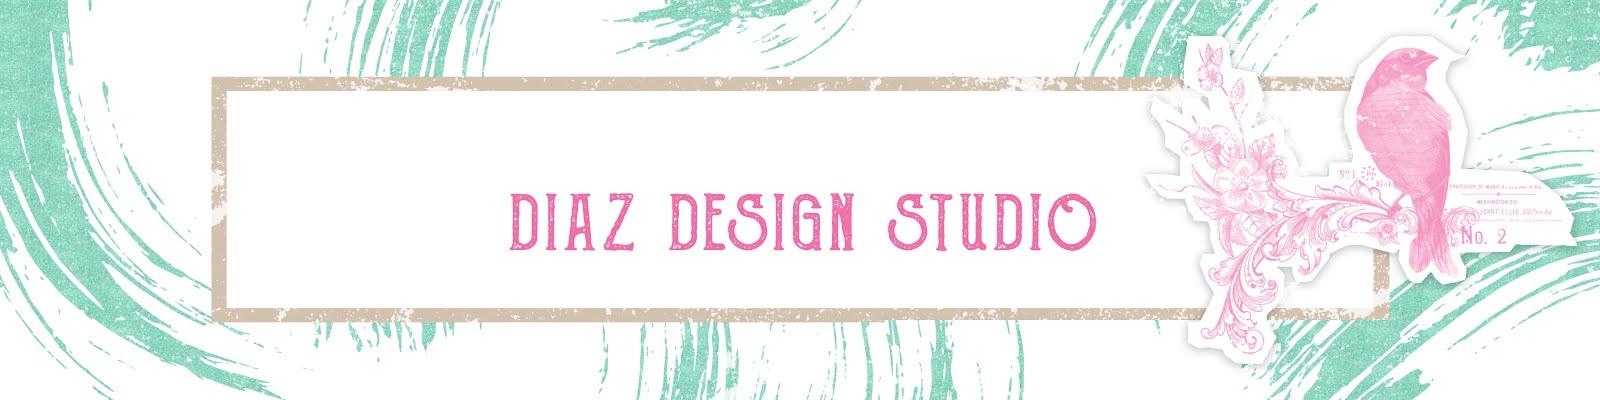 J.J. Diaz design